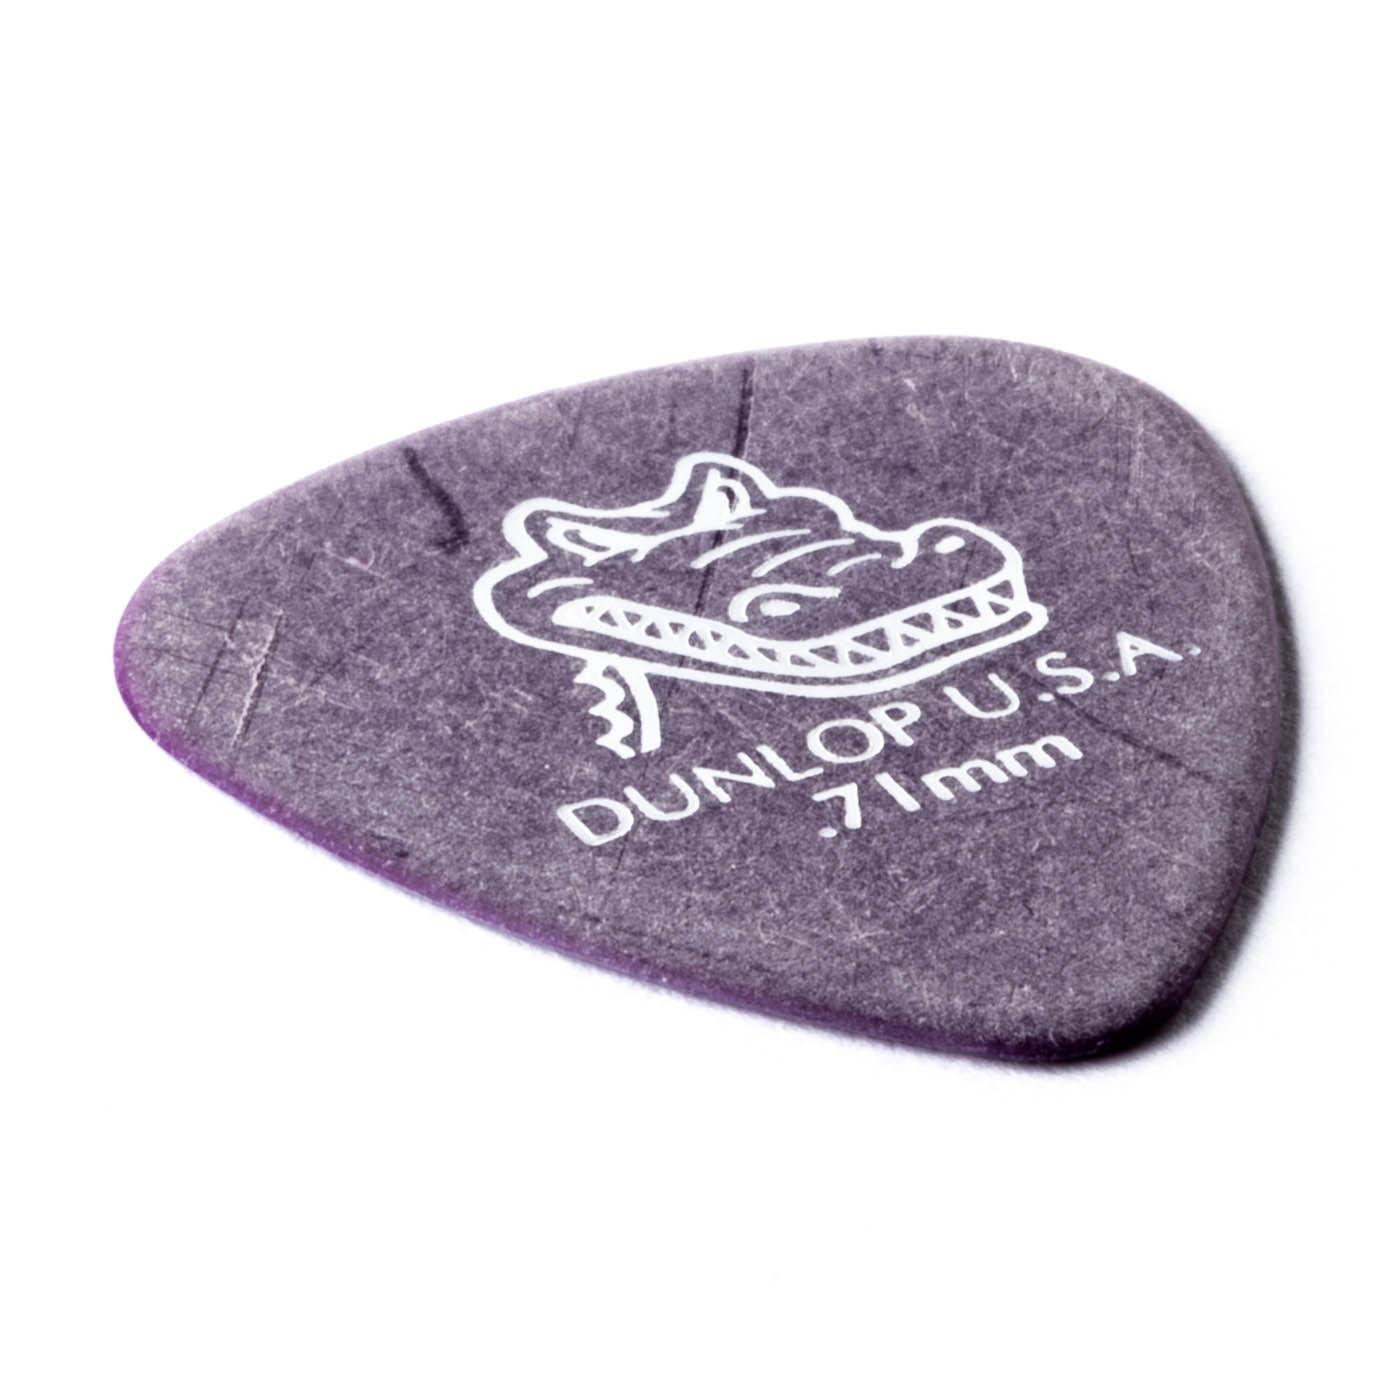 Dunlop - Gator Grip 0,71 lilac